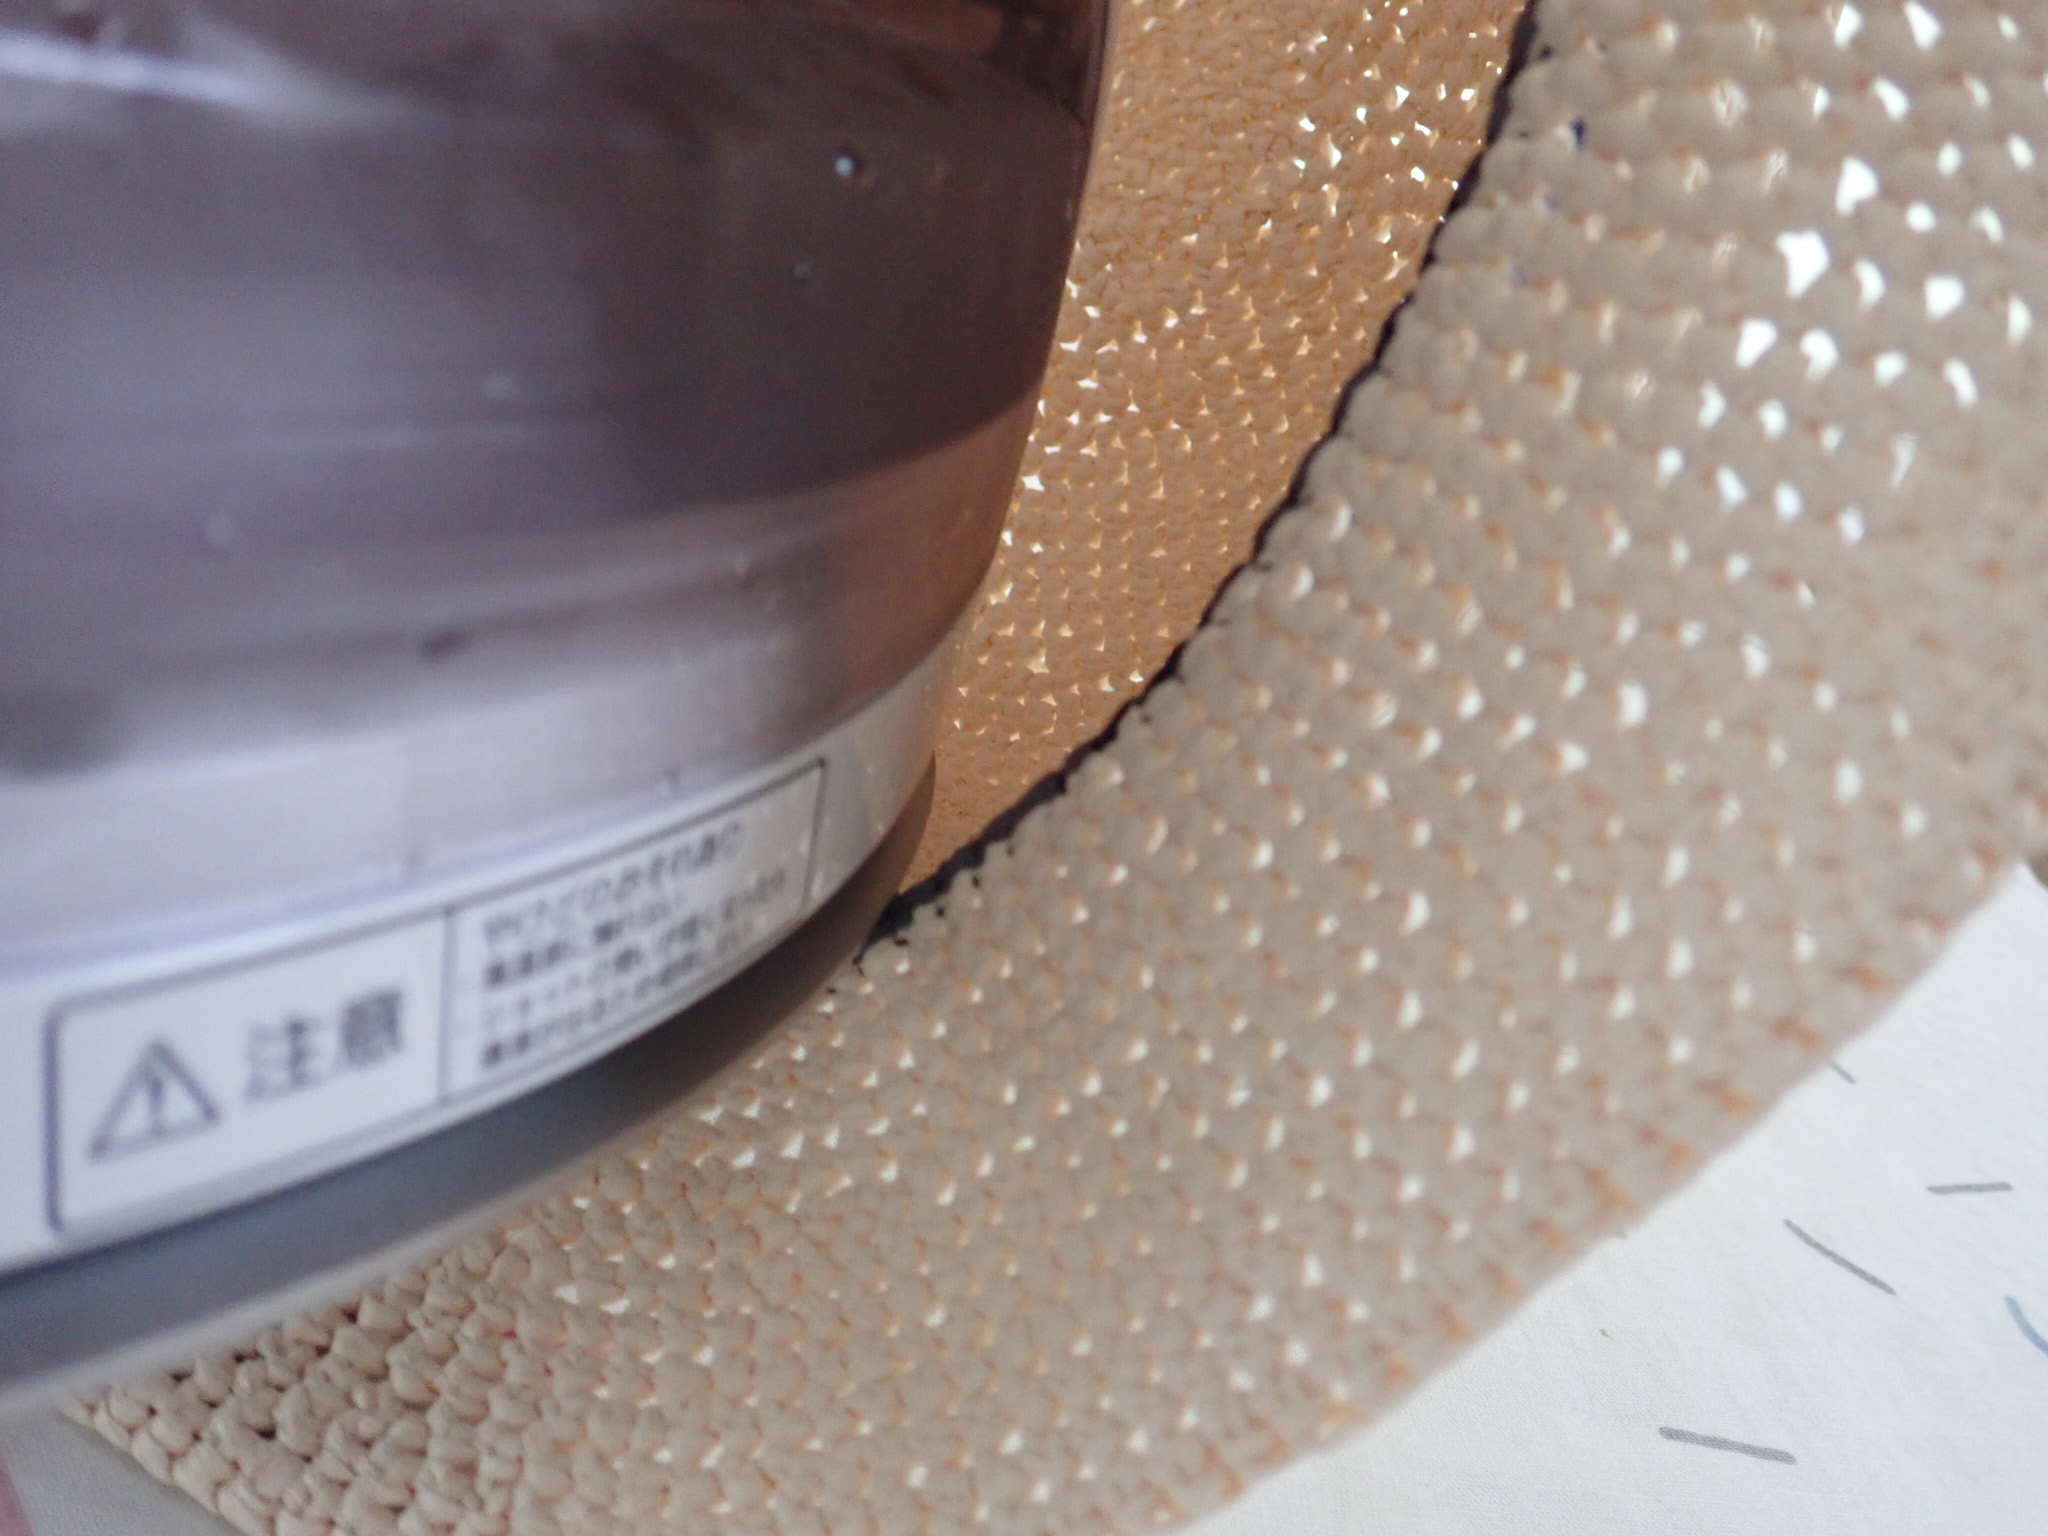 WechatIMG430 - 驚き!ぺしゃんこの帽子が簡単に復活!!一体どうやって!?